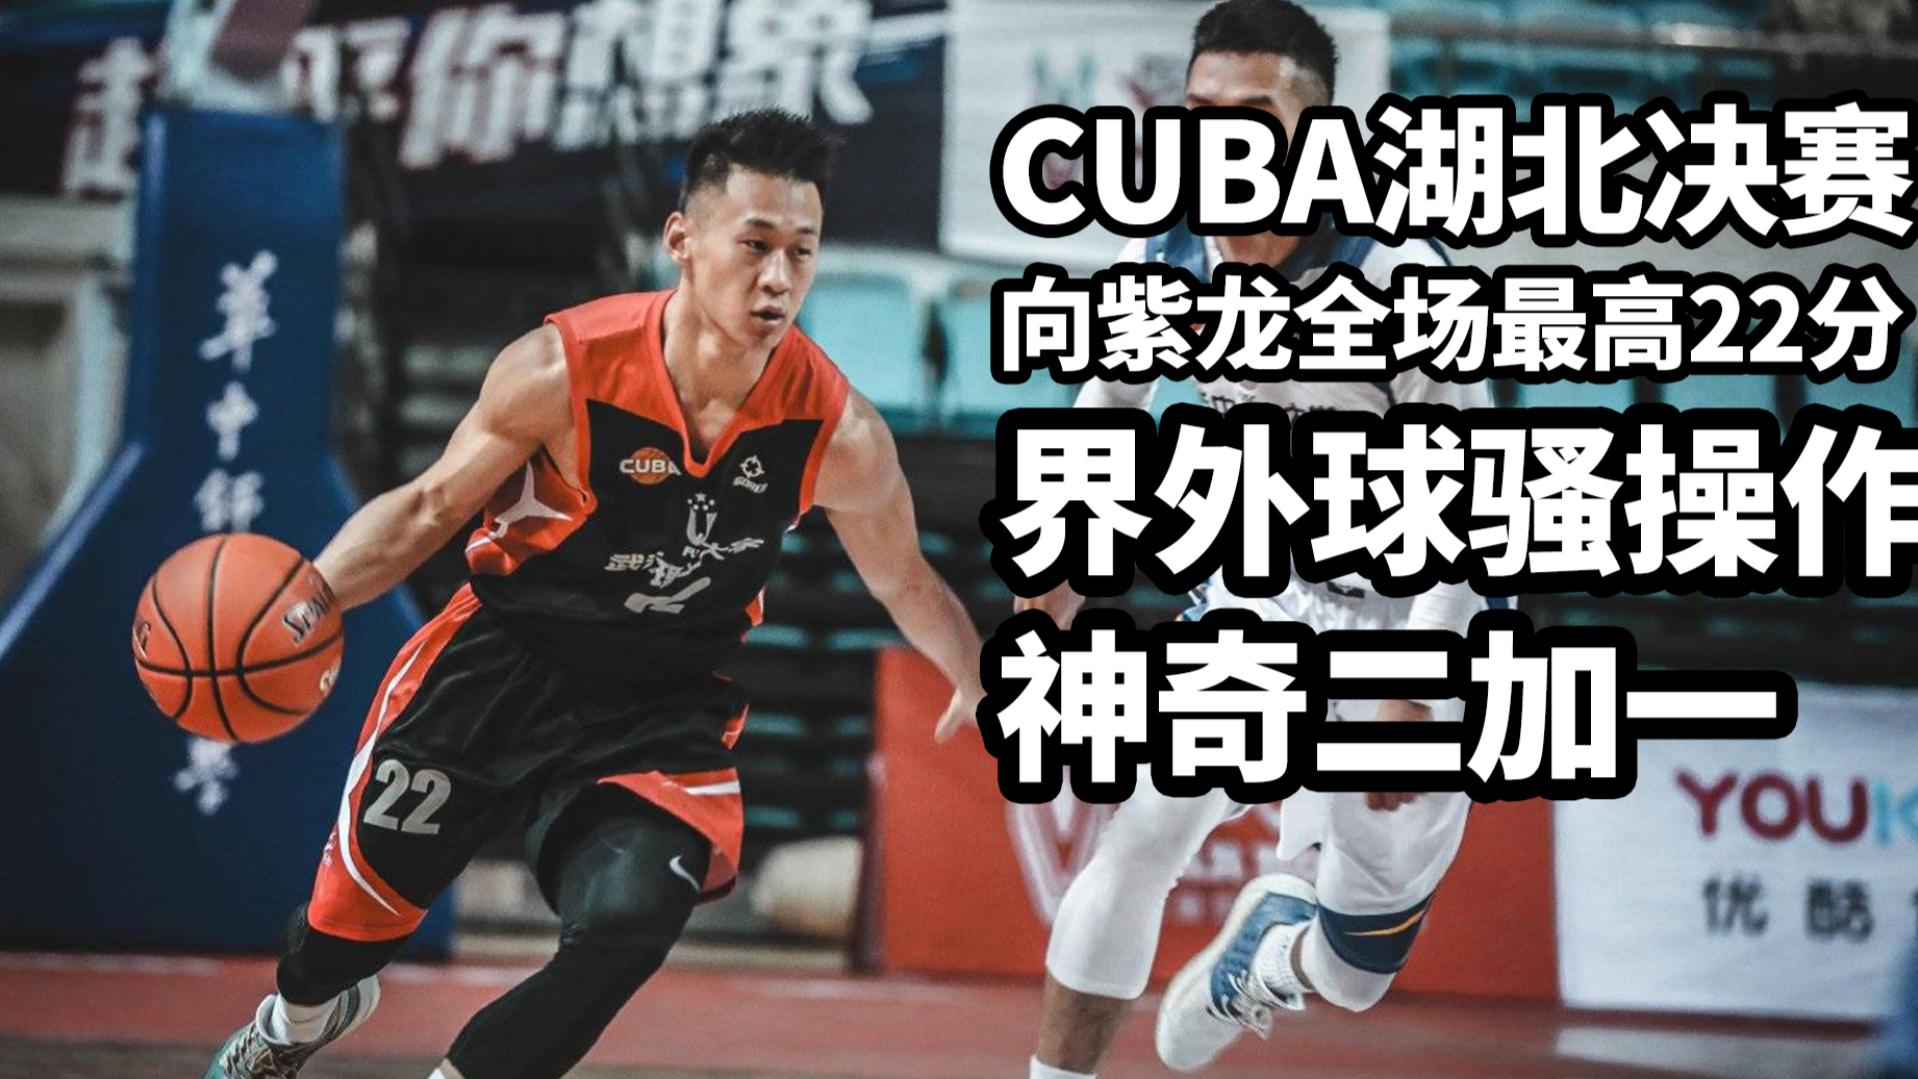 【CUBA】向紫龙砍全场最高22分,发界外球复刻NBA经典骚操作!